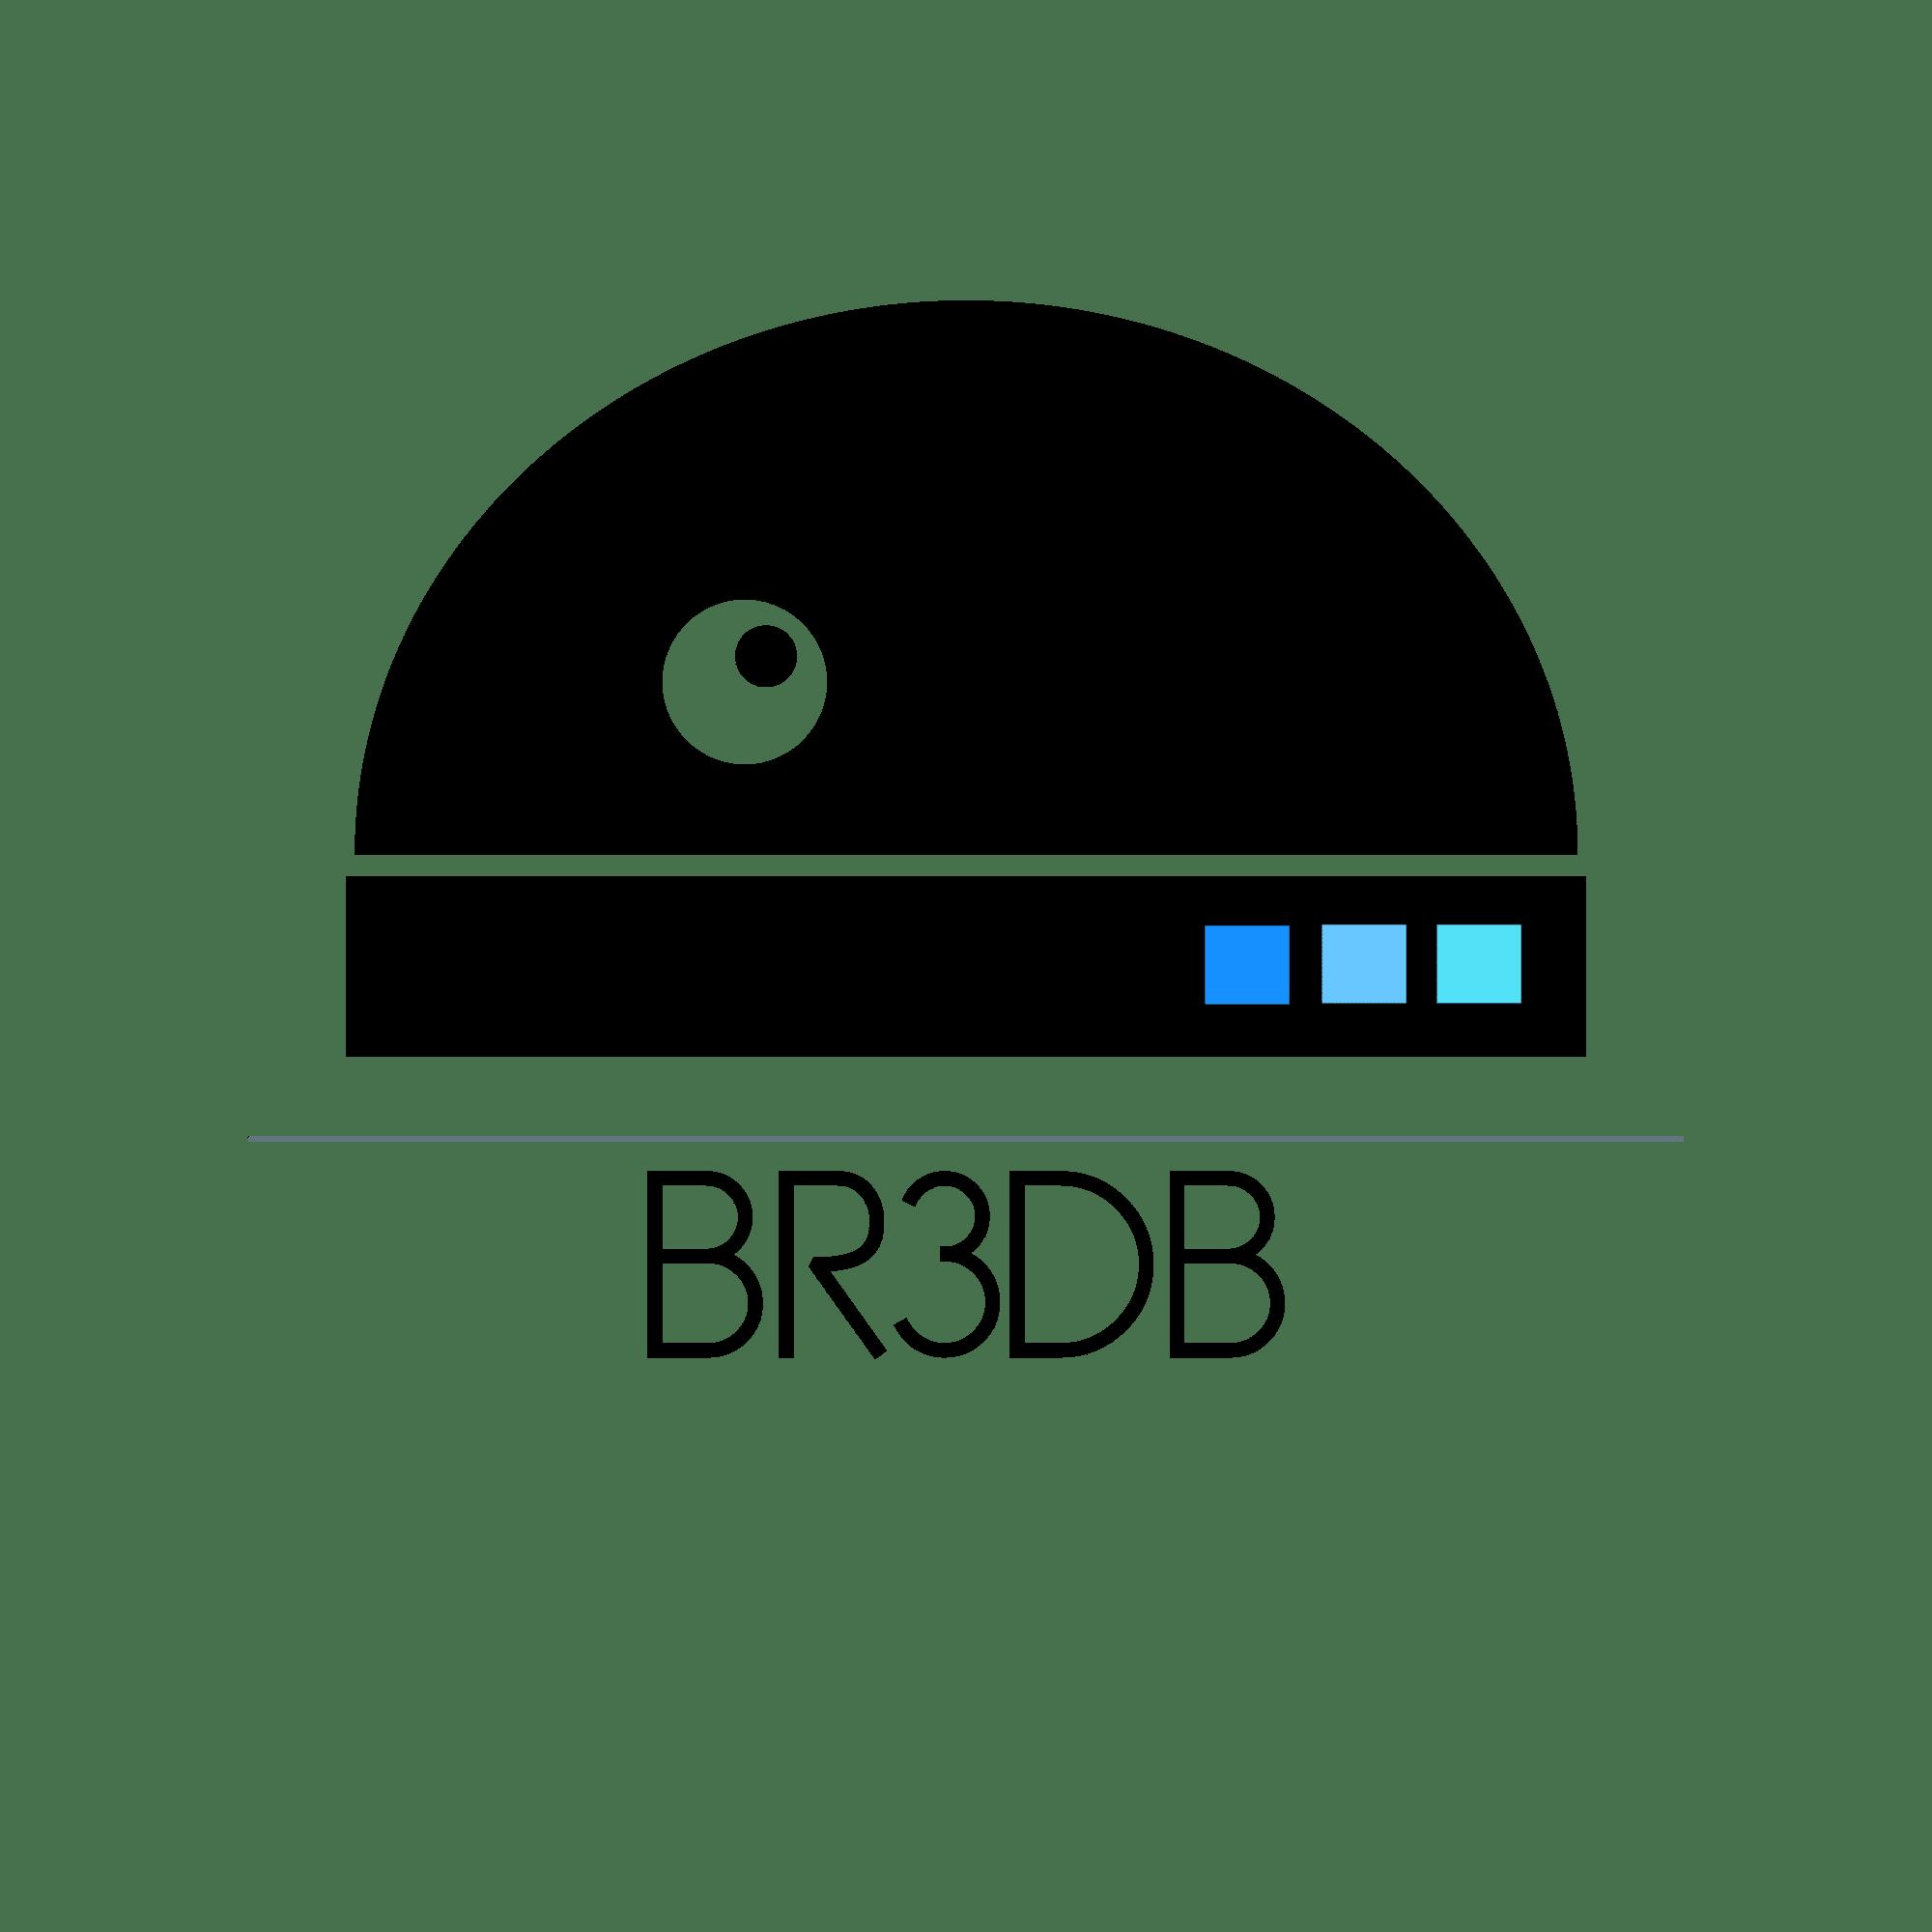 logo BR3DB